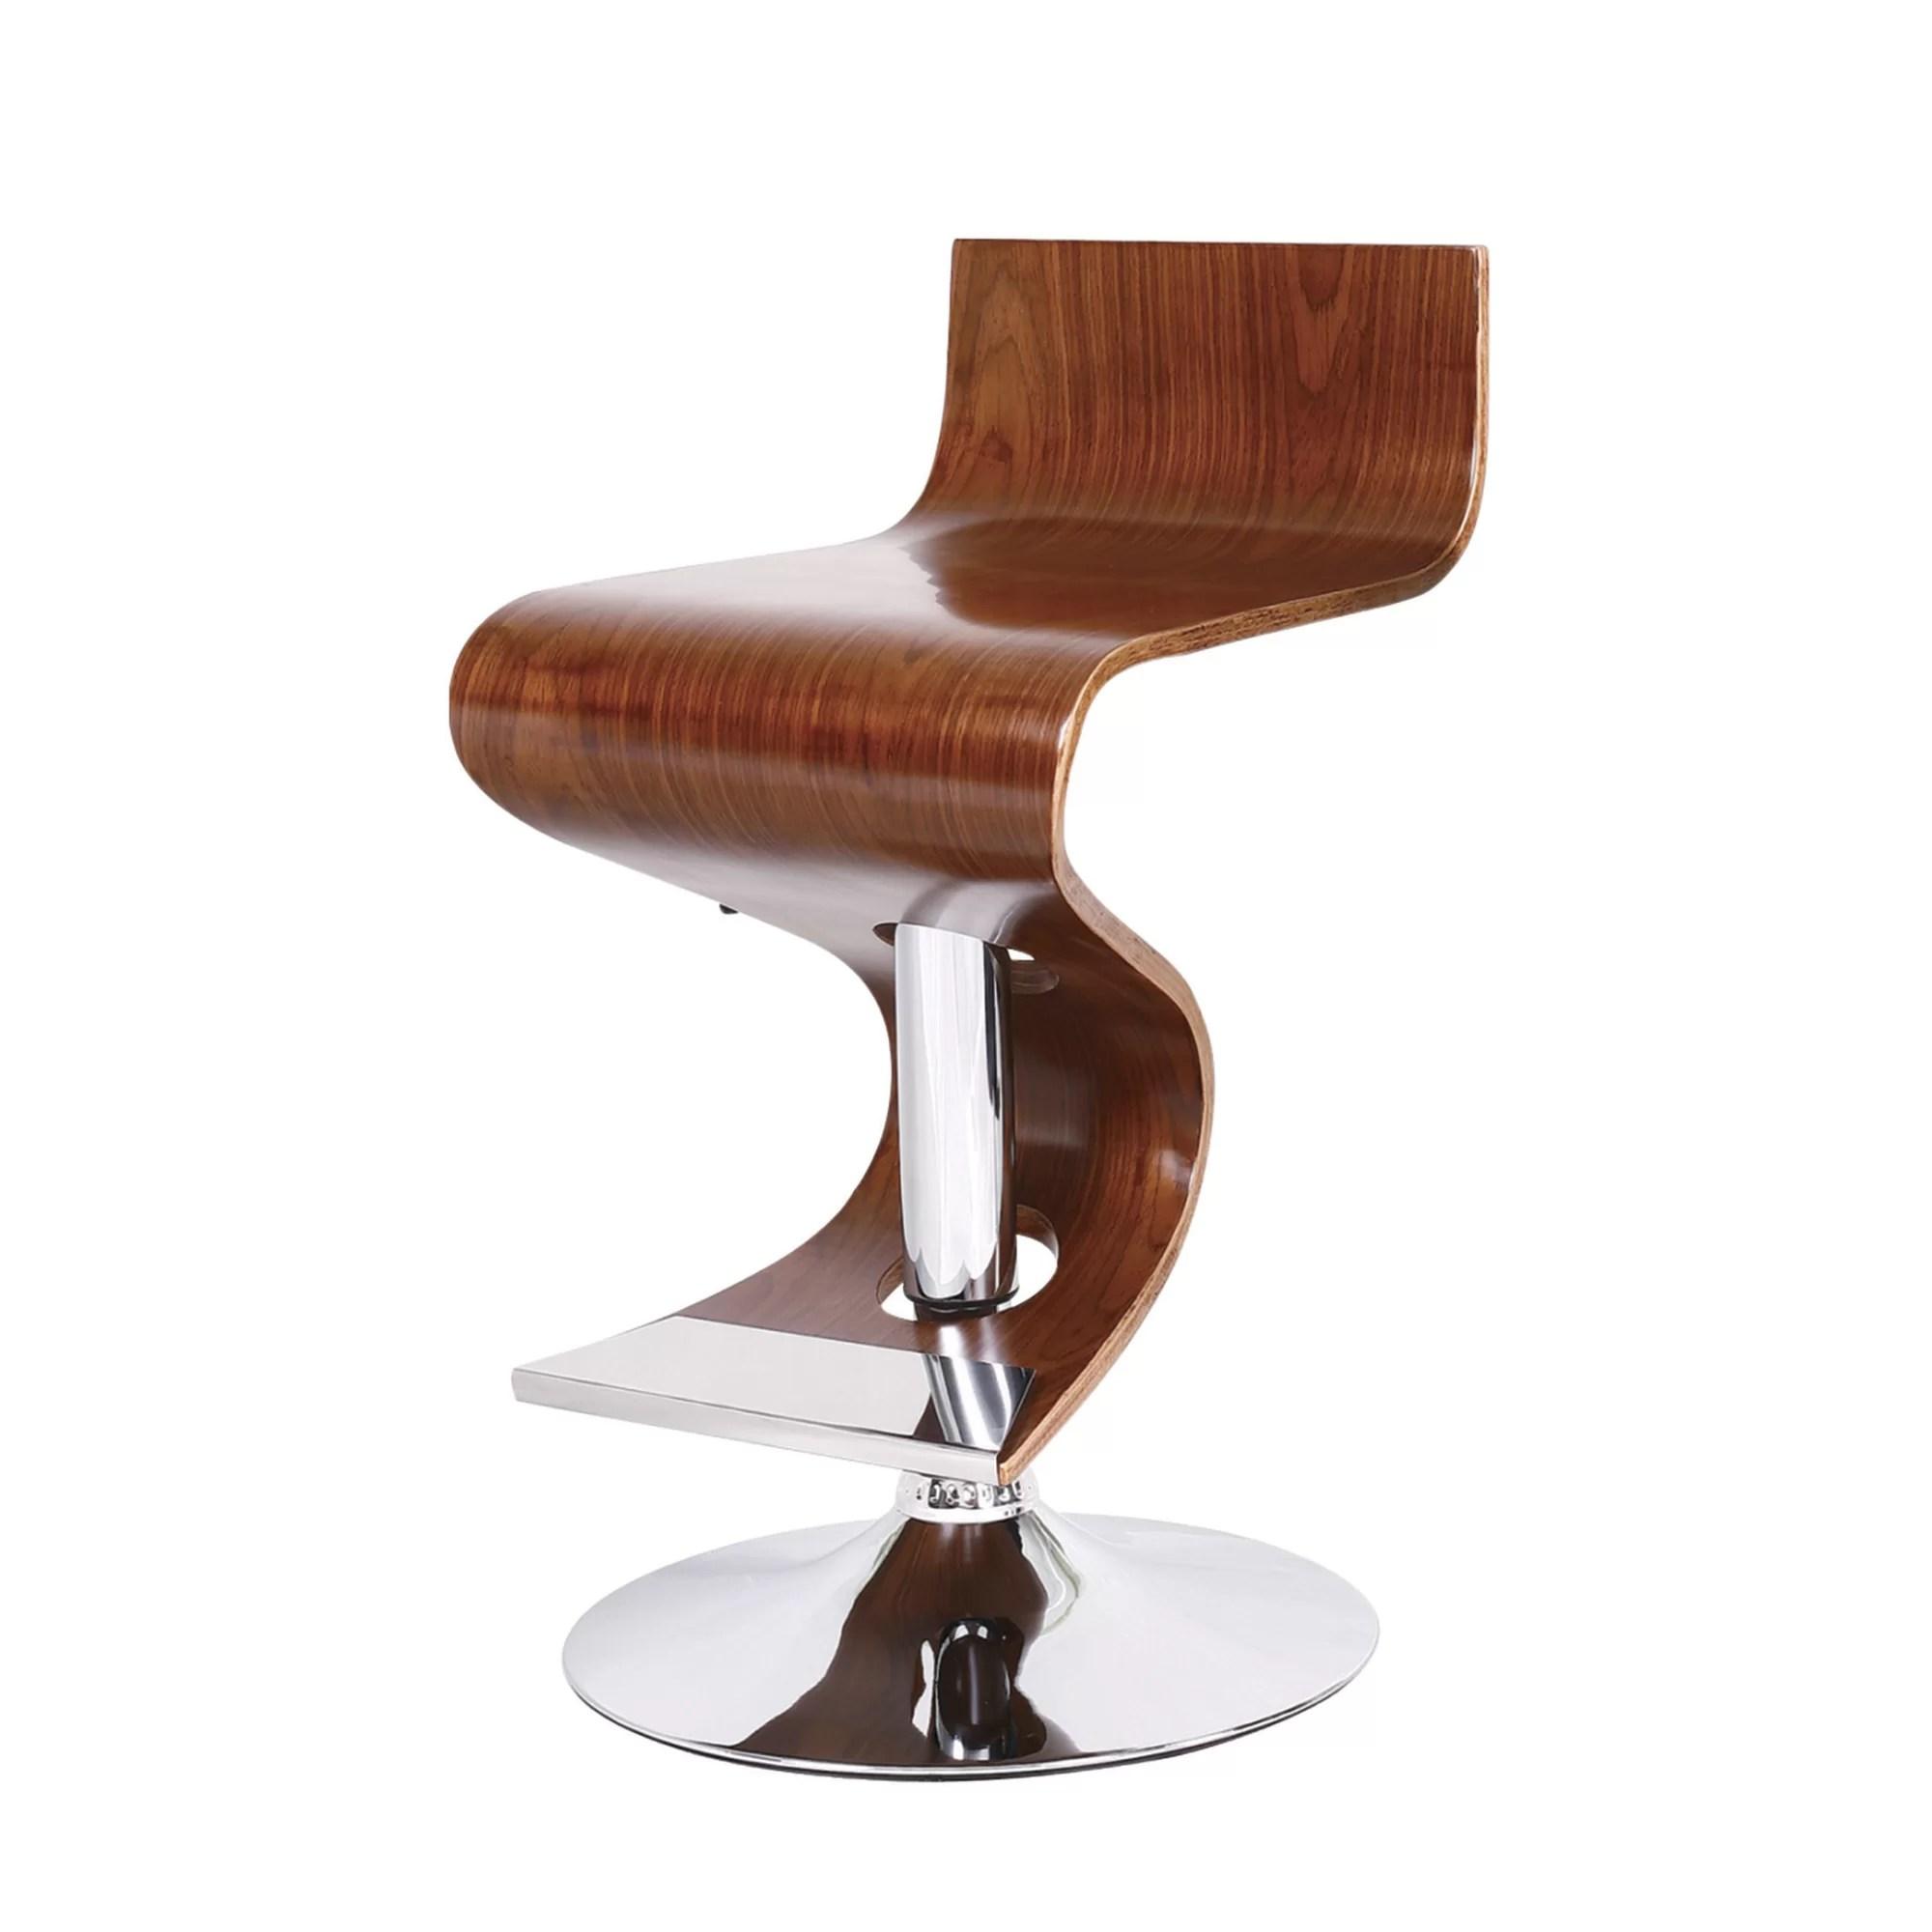 purist kitchen faucet counter ideas adjustable height swivel bar stool & reviews | allmodern